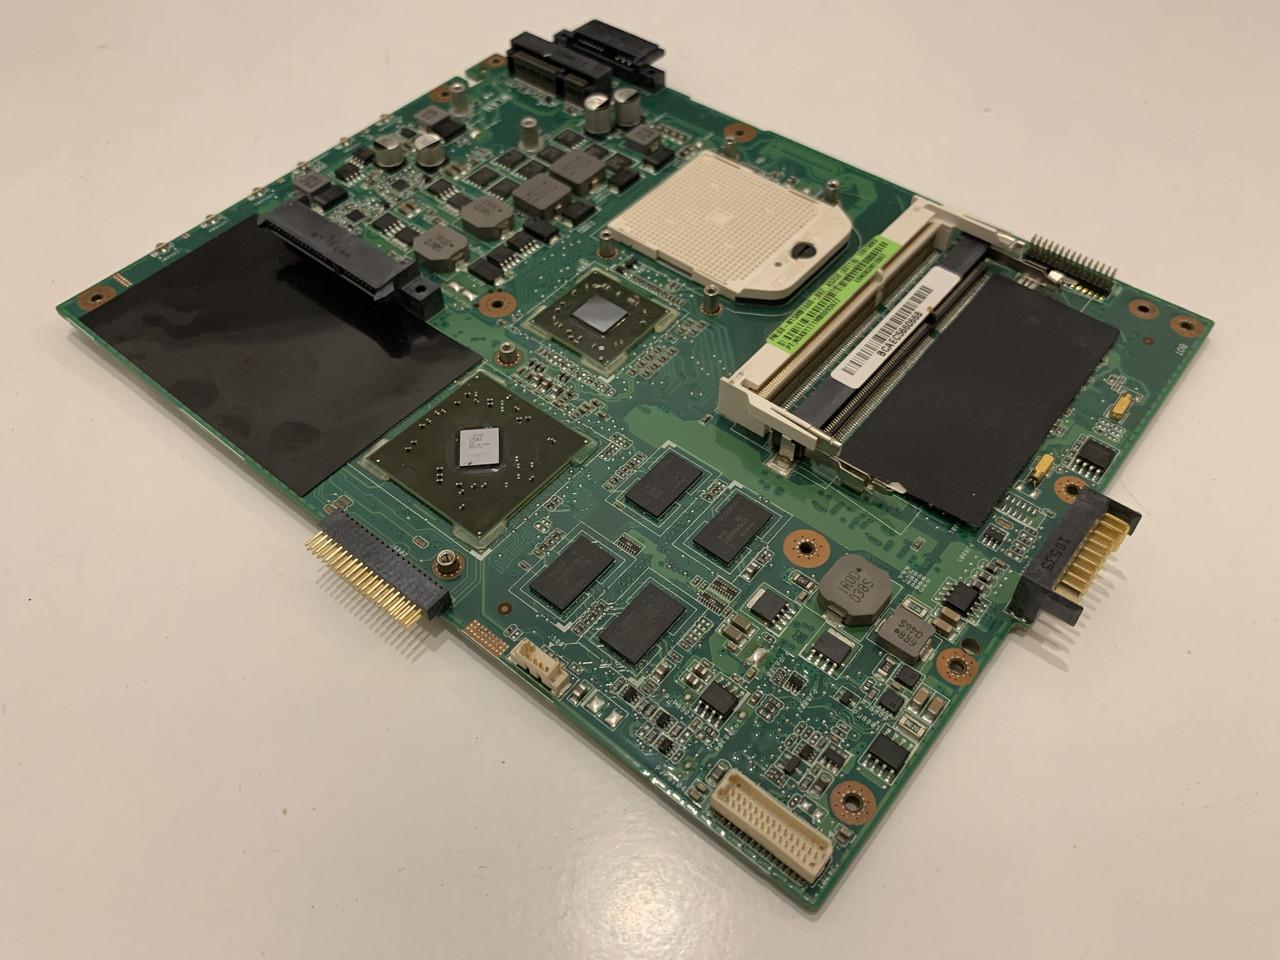 Запчасти для ноутбука Asus K52D - Материнская плата N15MB1000-07 (ПОД ВОССТАНОВЛЕНИЕ)